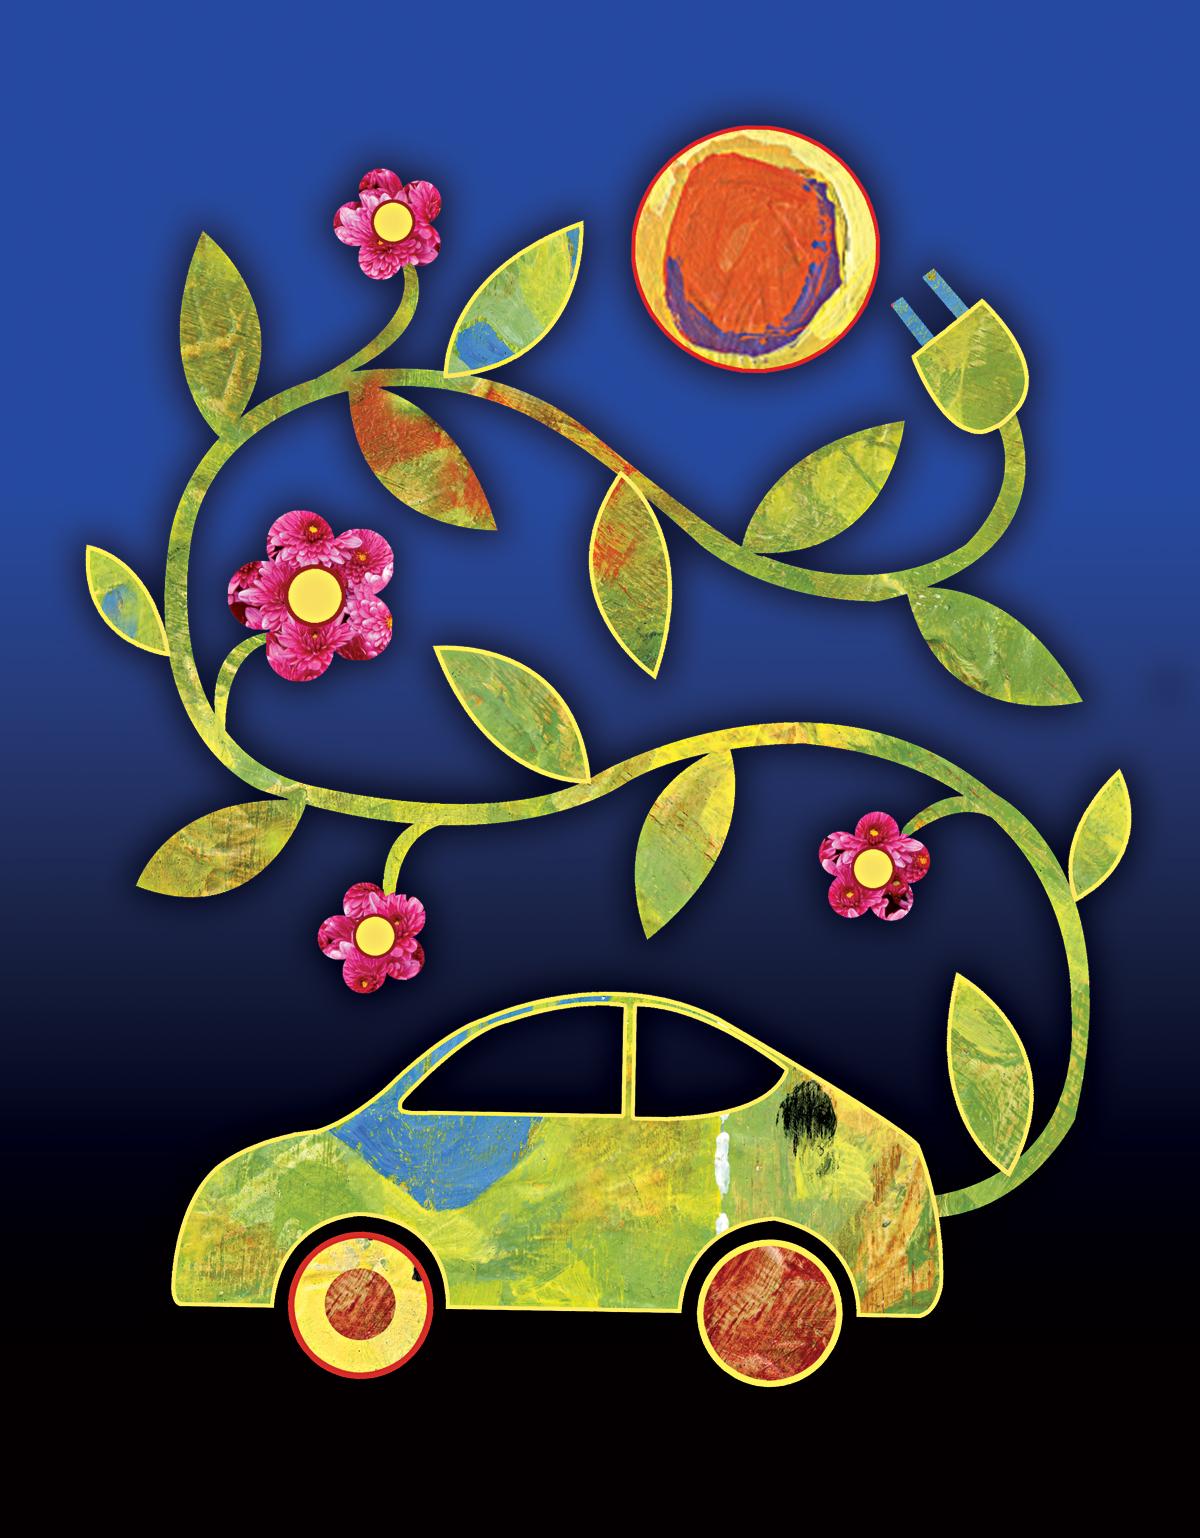 dryden-electric-car.jpg